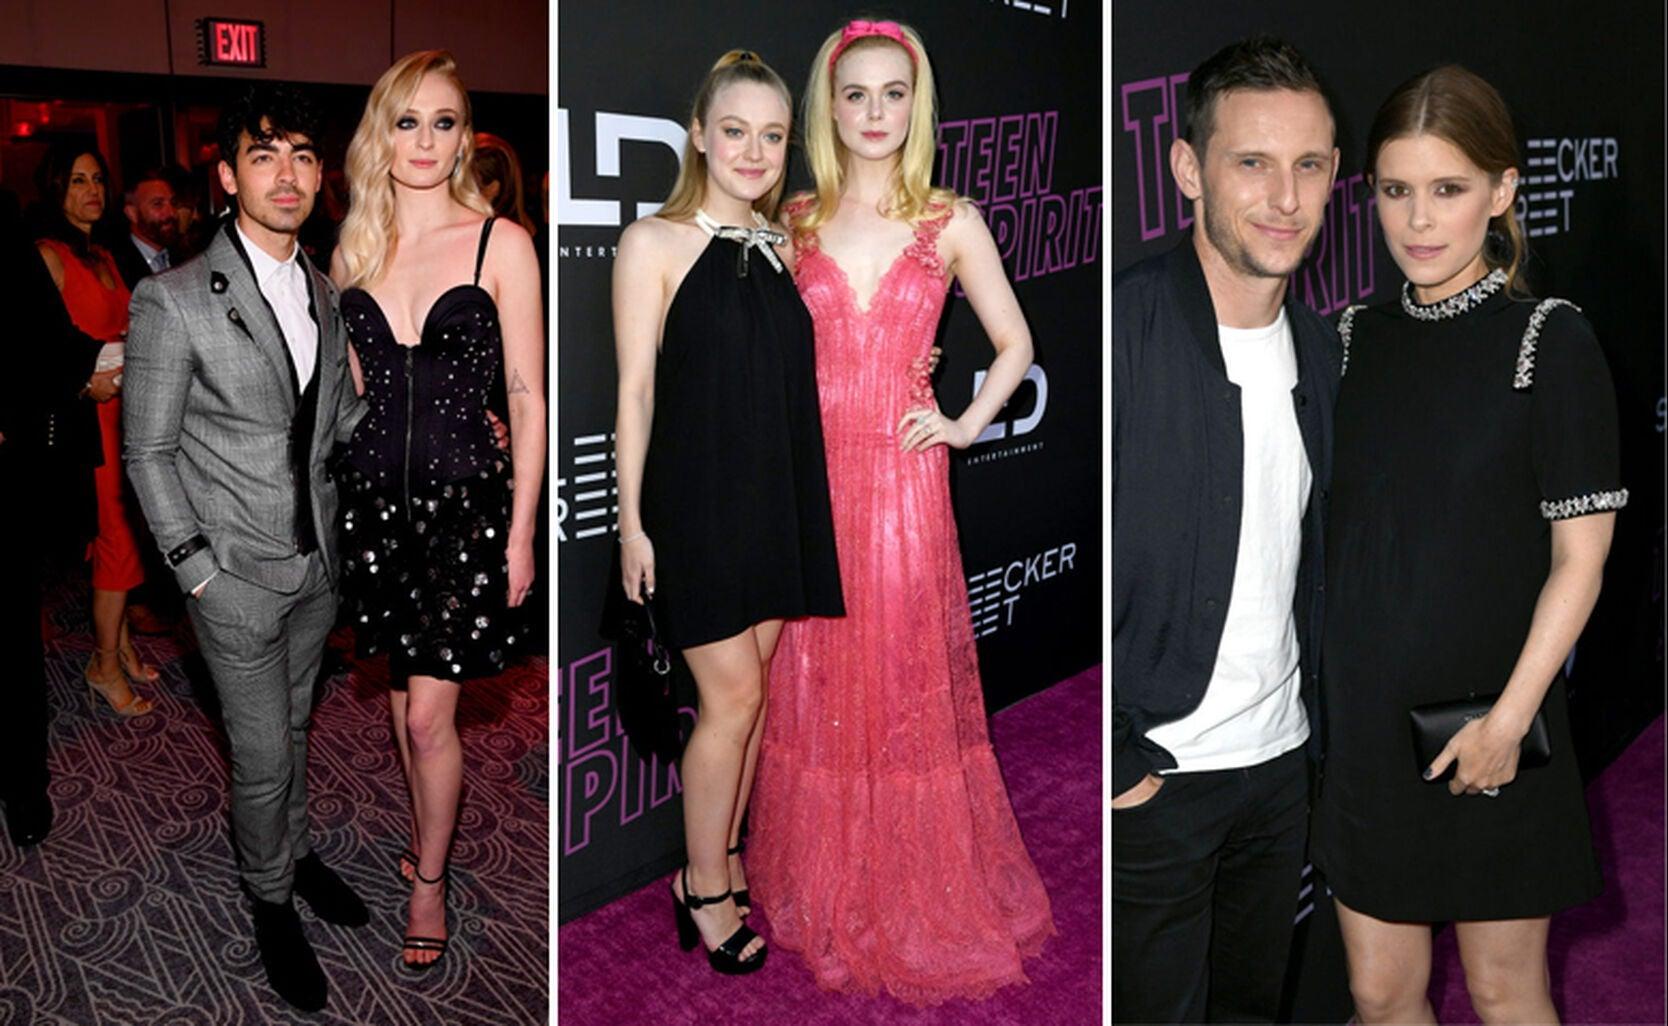 Joe Jonas with Sophie Turner, Dakota Fanning (L) with Elle Fanning, Jamie Bell with Kate Mara